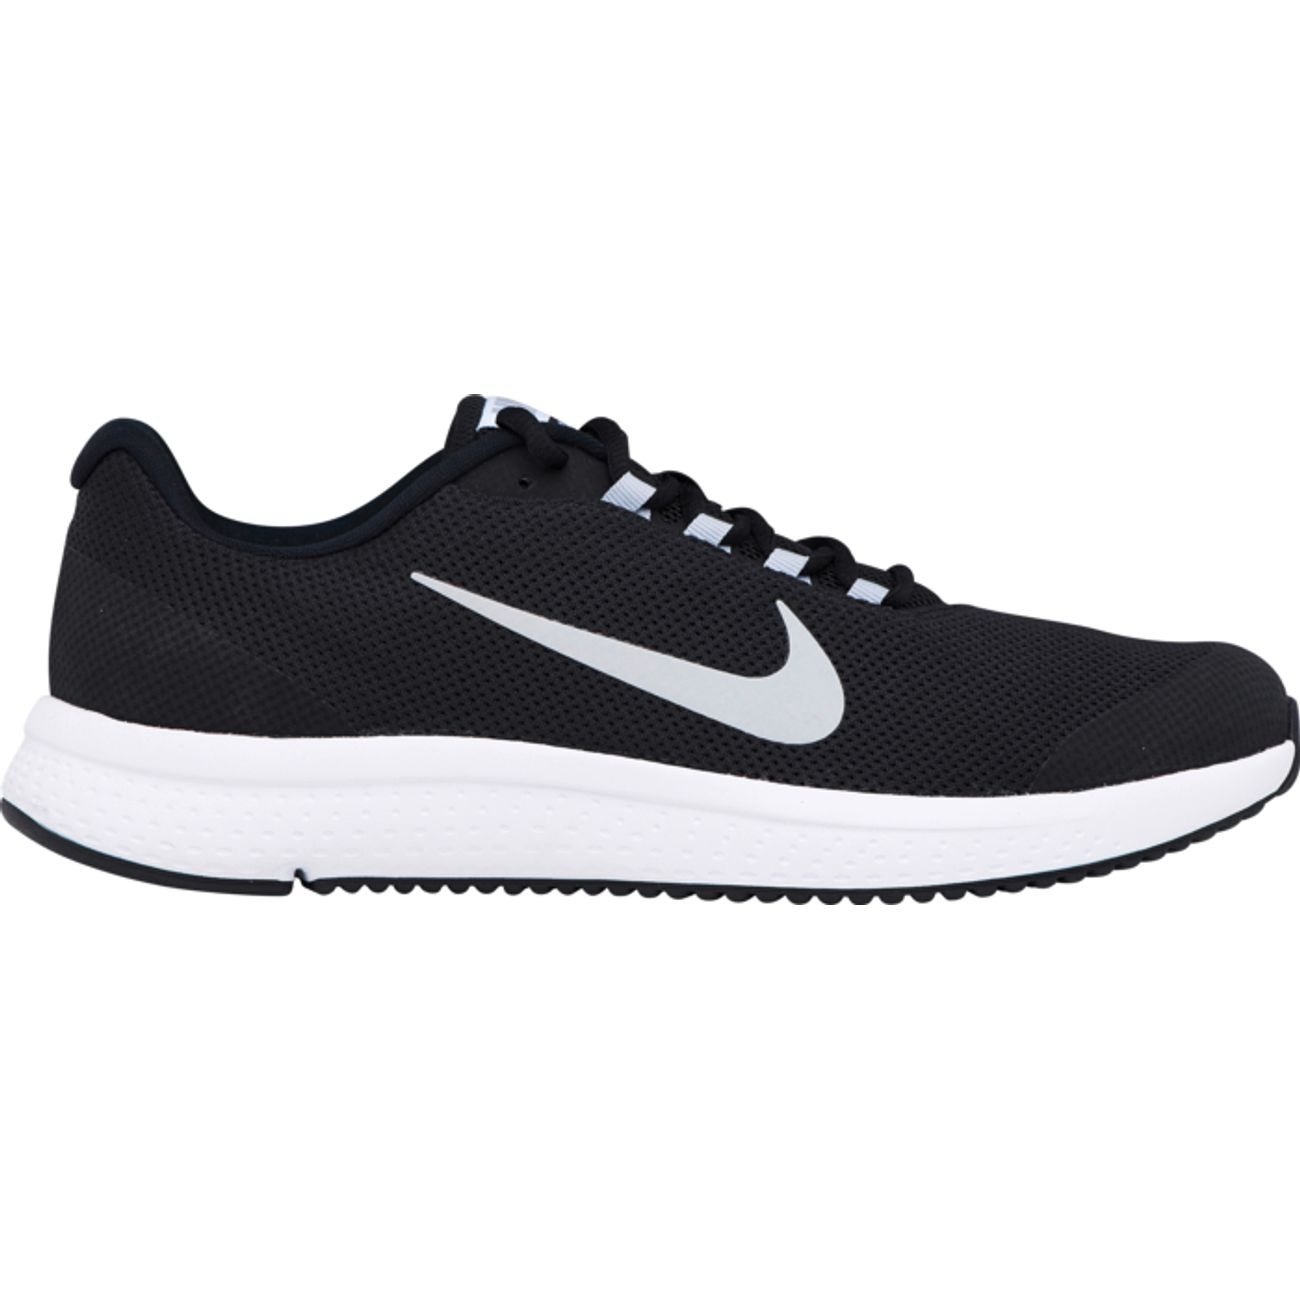 Chaussures Running Nike Homme M Runallday Basses 31KcTlFJ